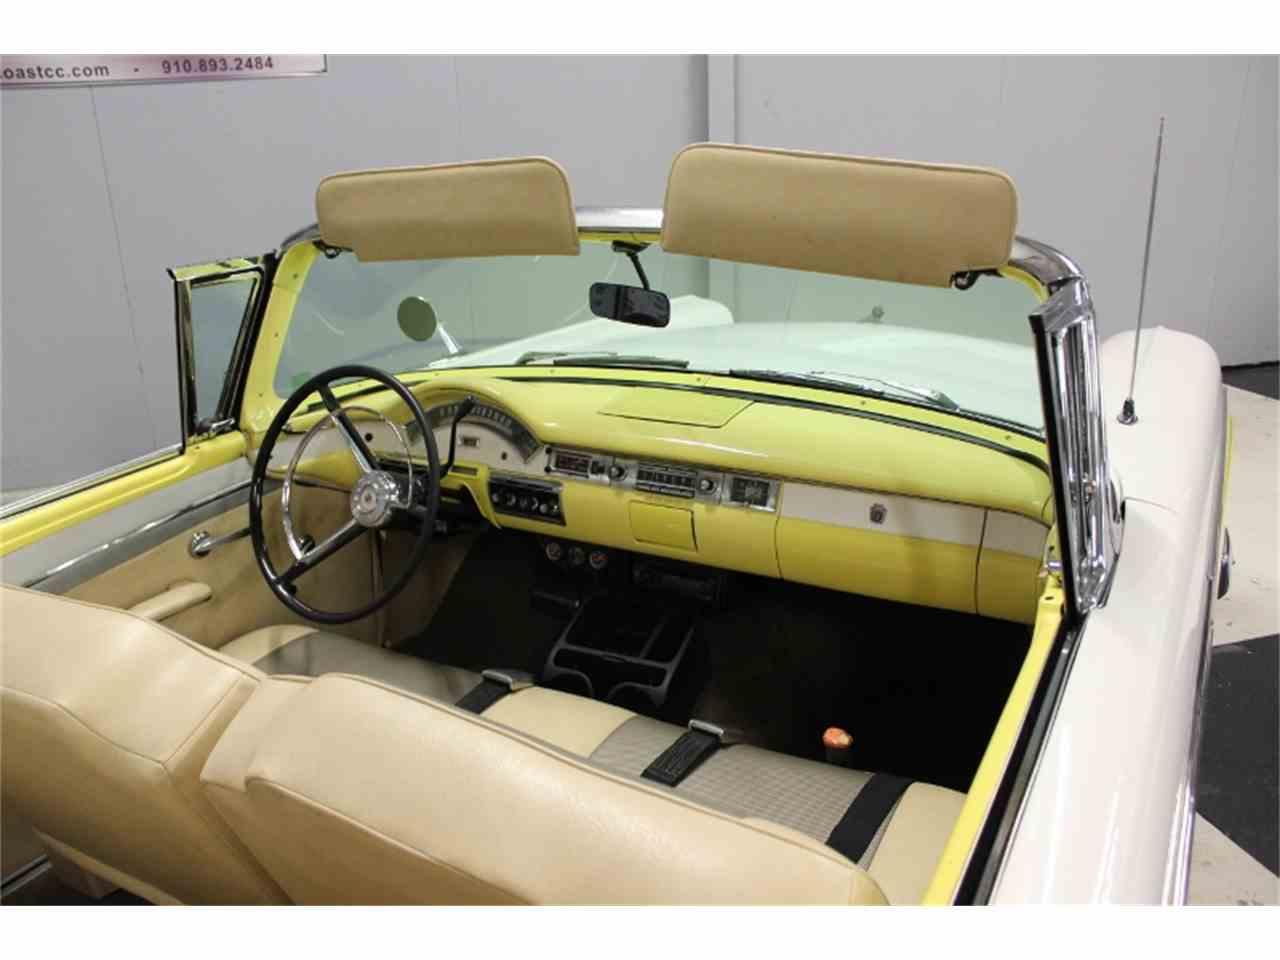 Large Picture of Classic '57 Ford Fairlane 500 located in Lillington North Carolina - $48,500.00 - LRPU